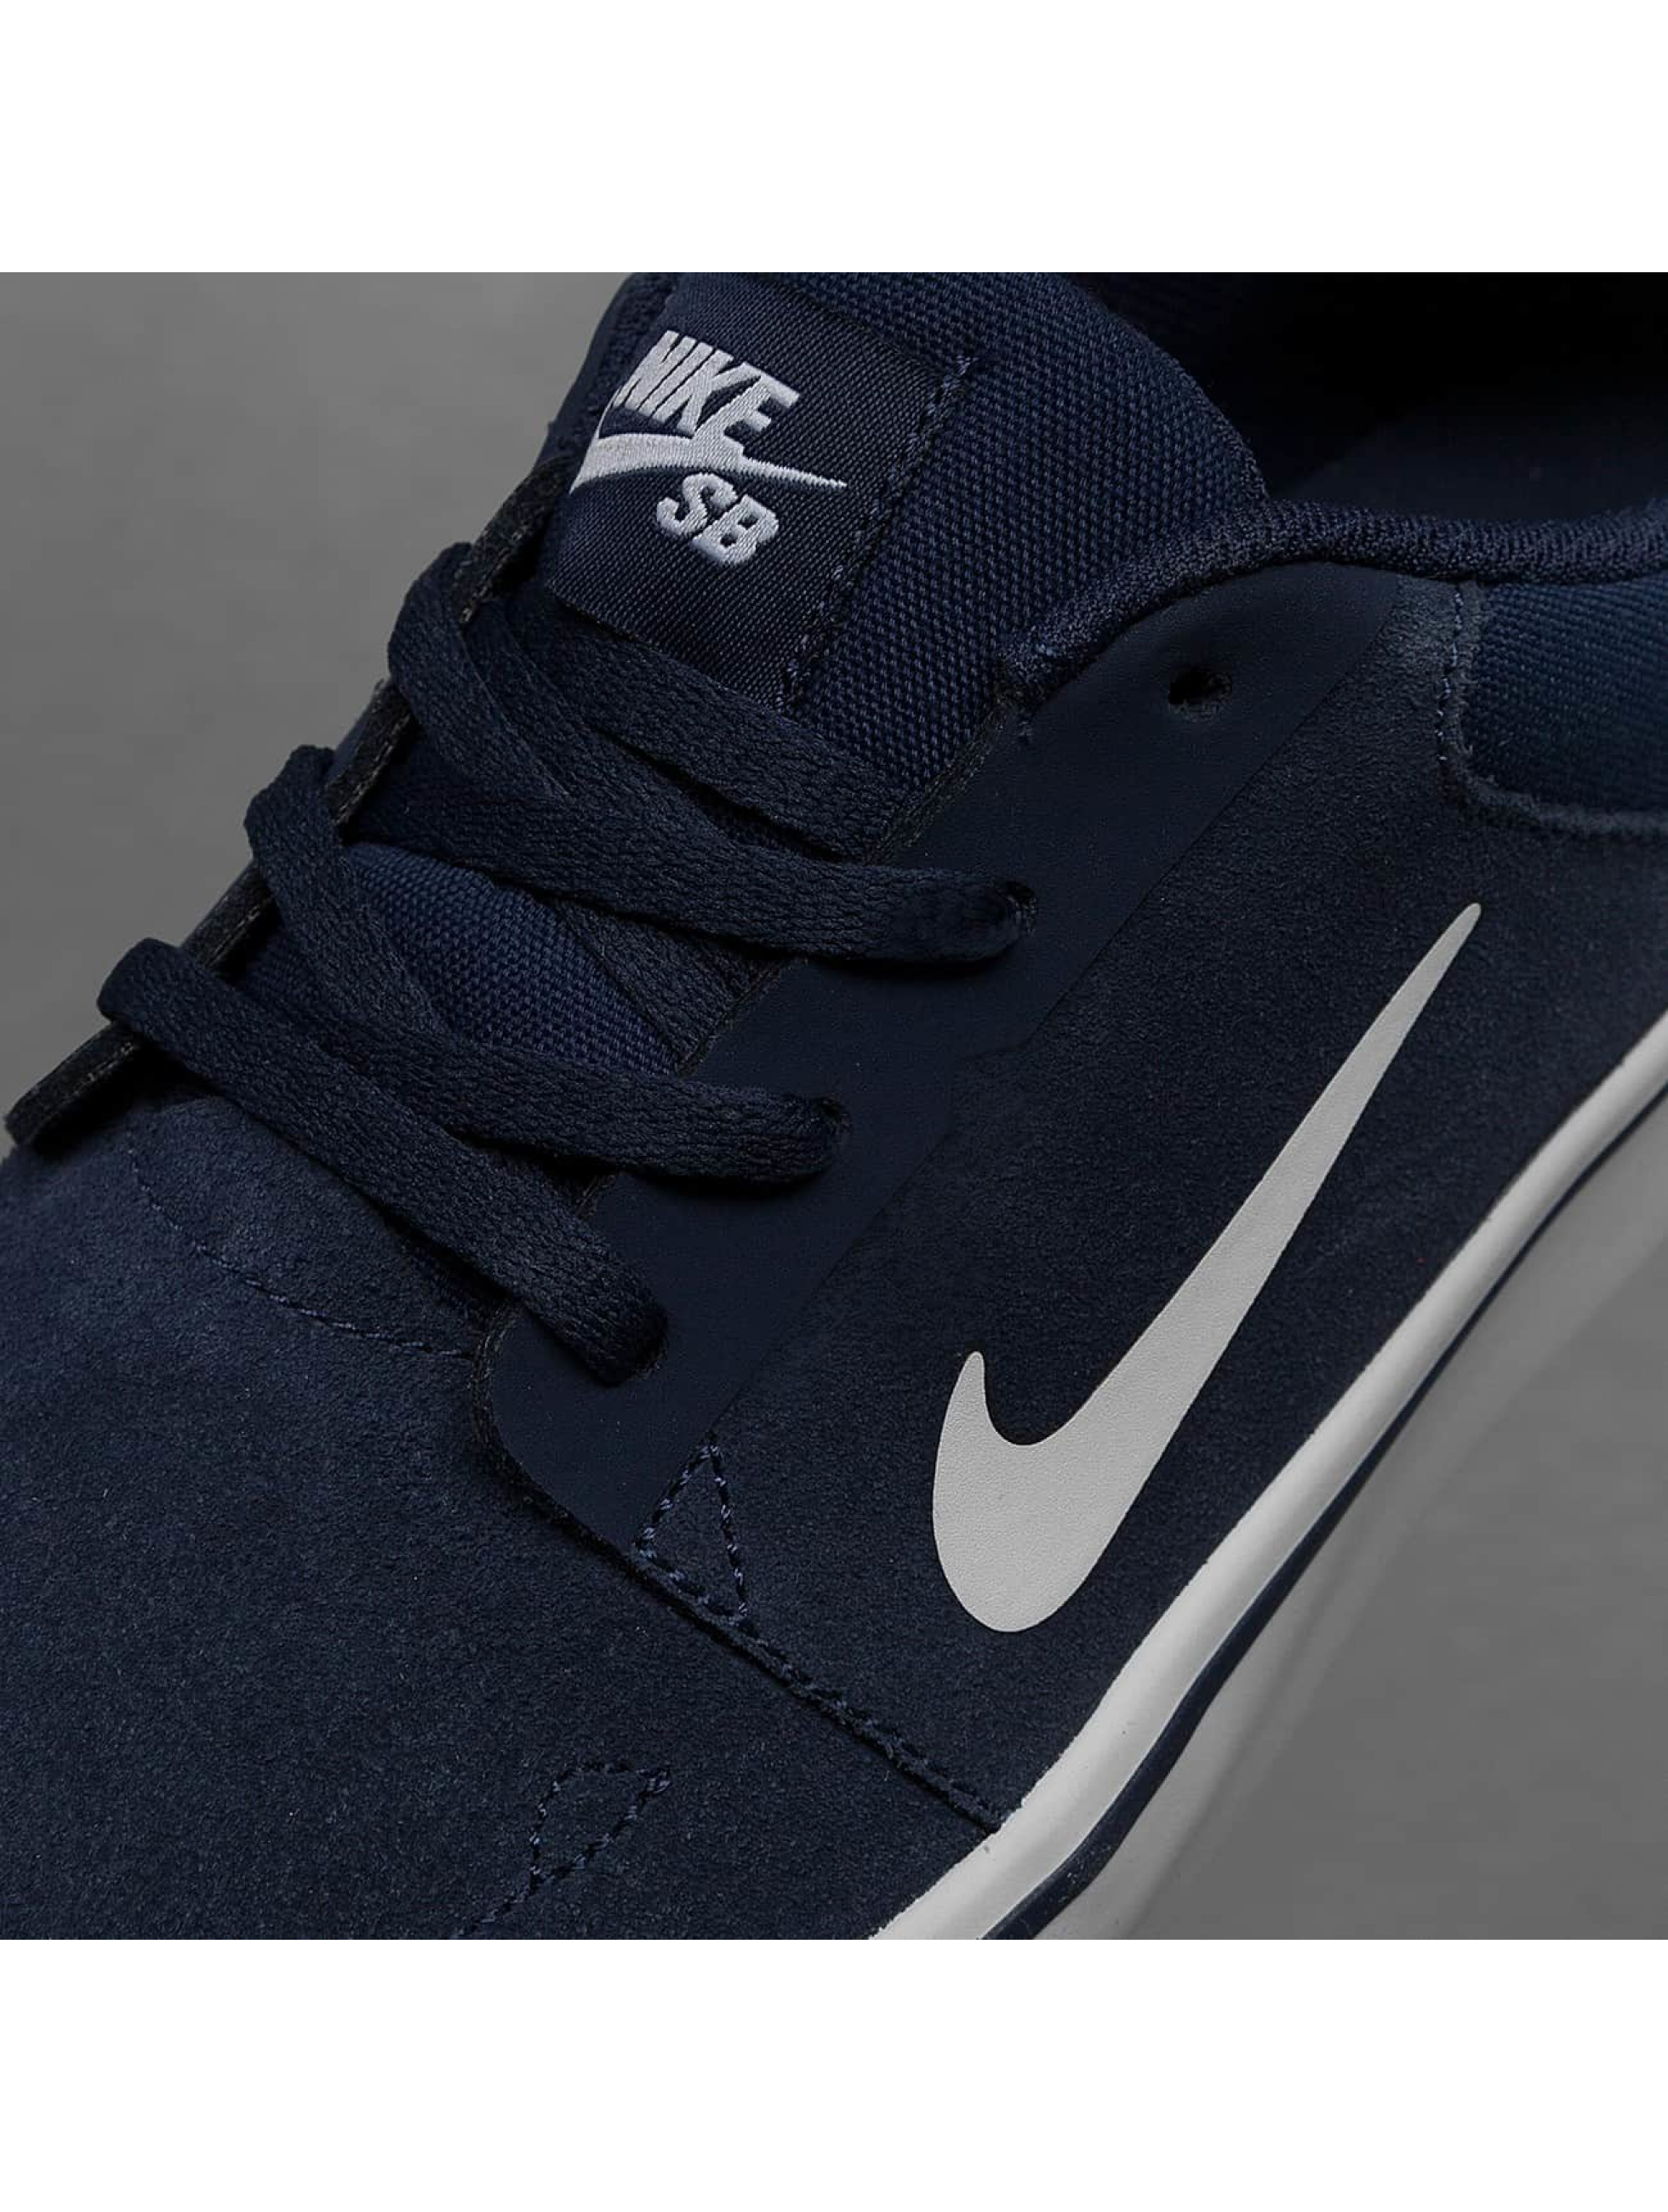 Nike SB Baskets SB Portmore bleu